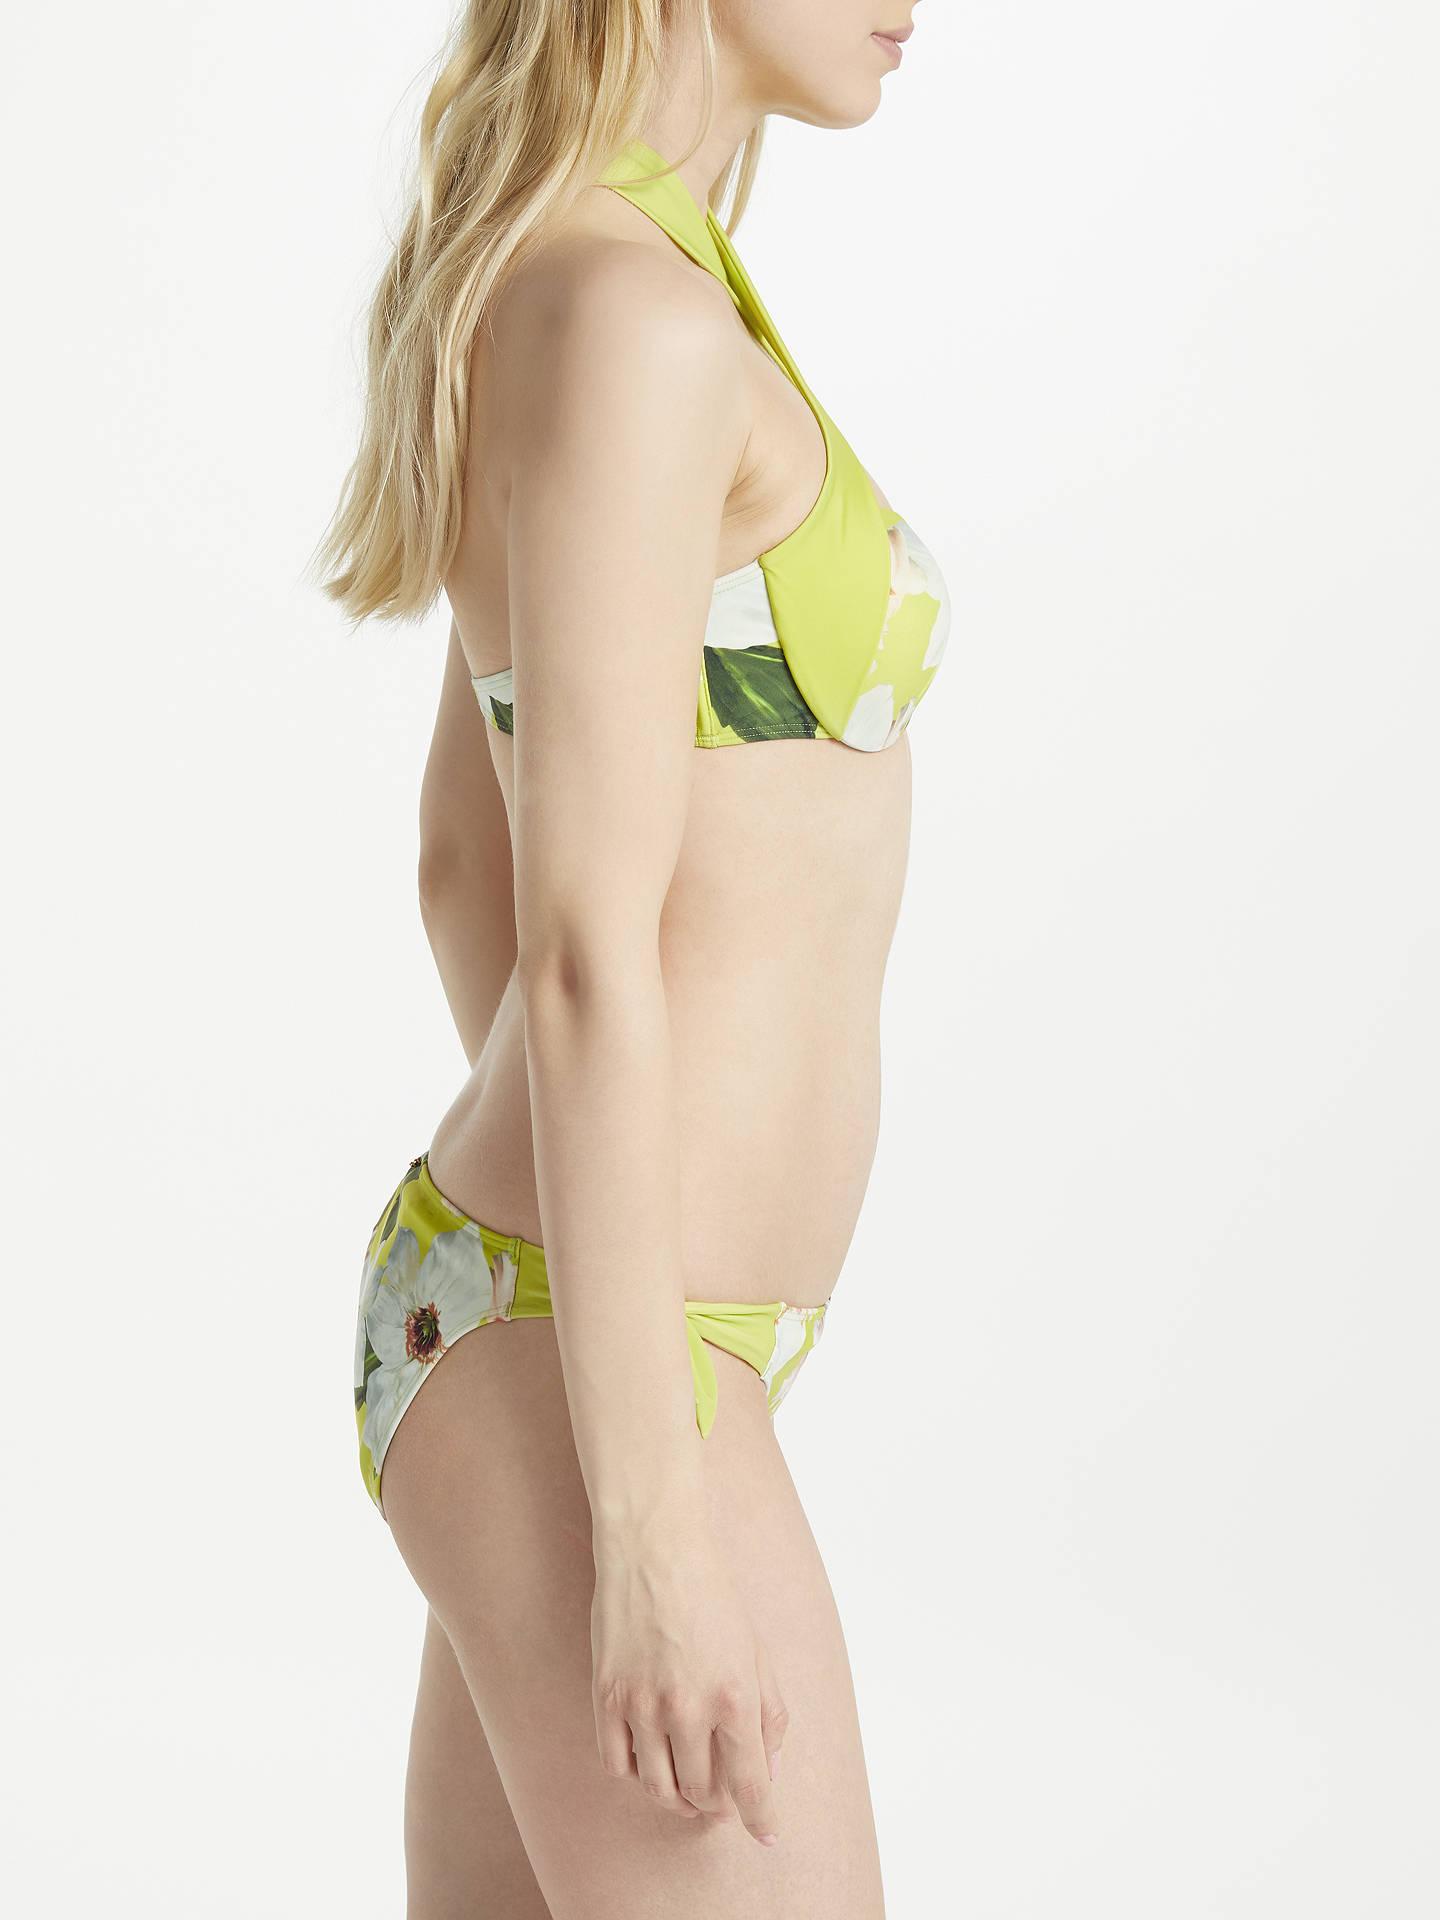 43d239c4f55 ... Buy Ted Baker Tuello Chatsworth Bloom Tie Side Bikini Briefs,  Green/Multi, 1